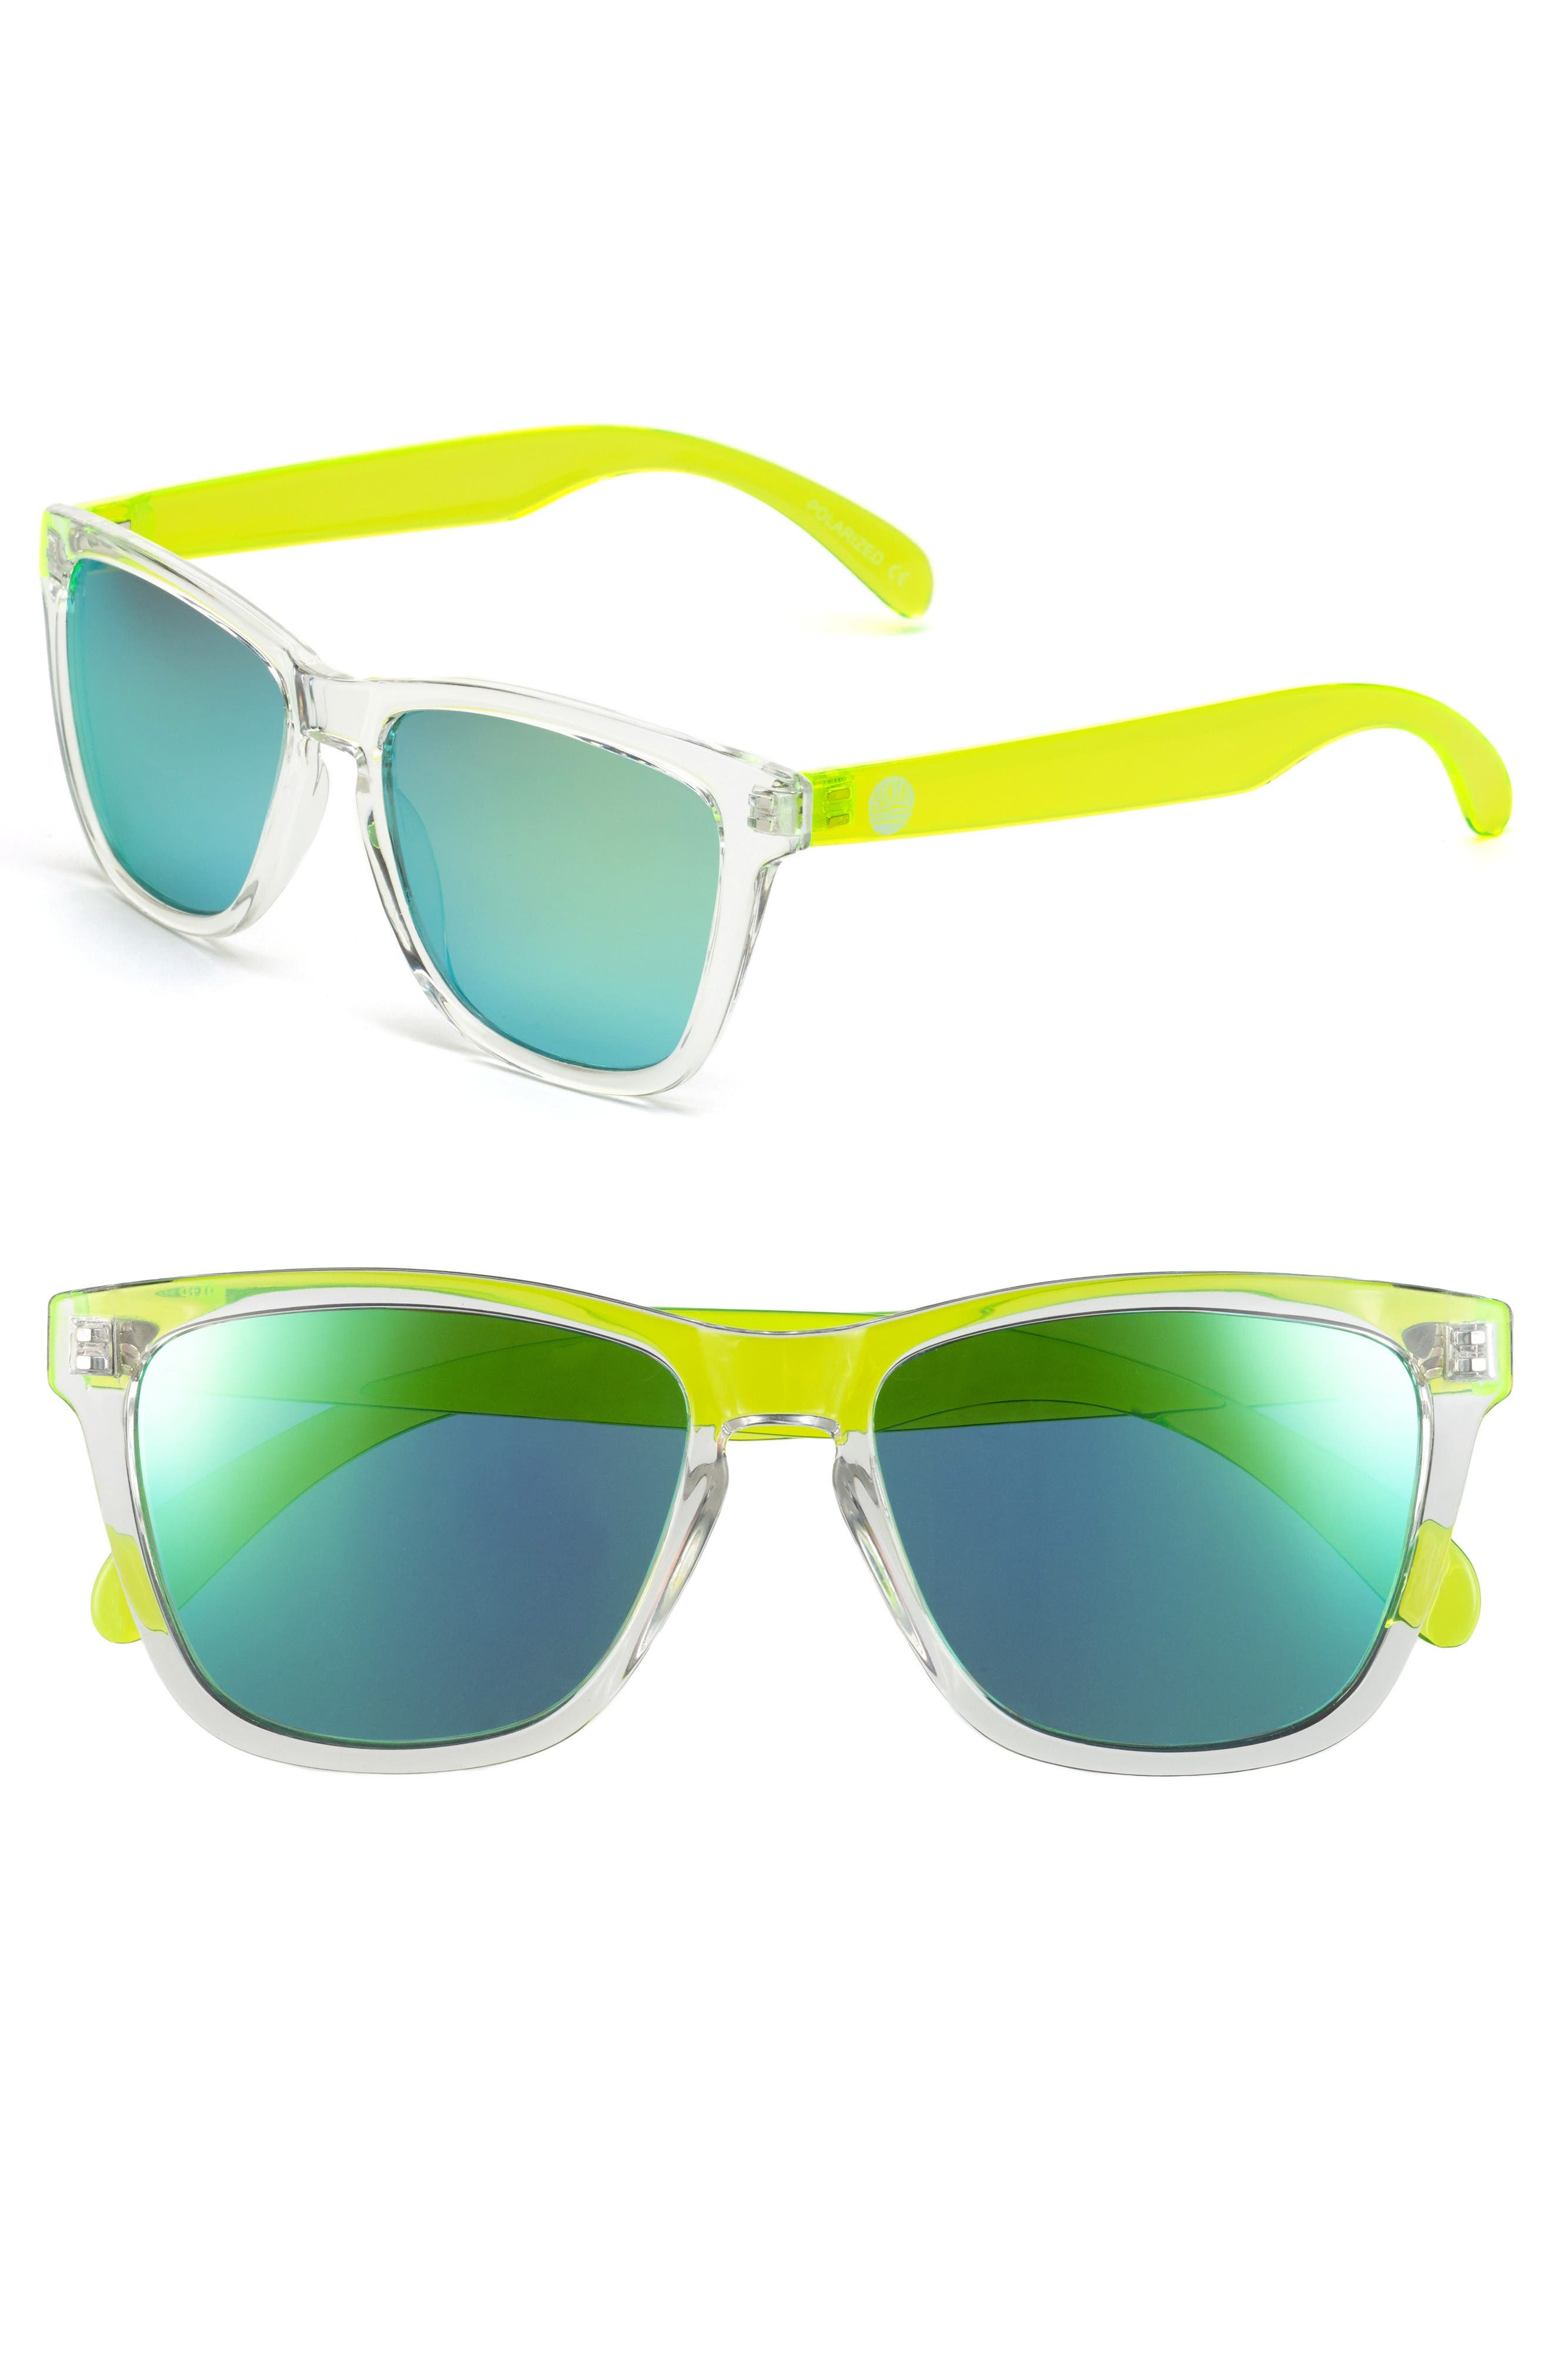 Alternate Image 1 Selected - Sunski Original 53mm Polarized Sunglasses